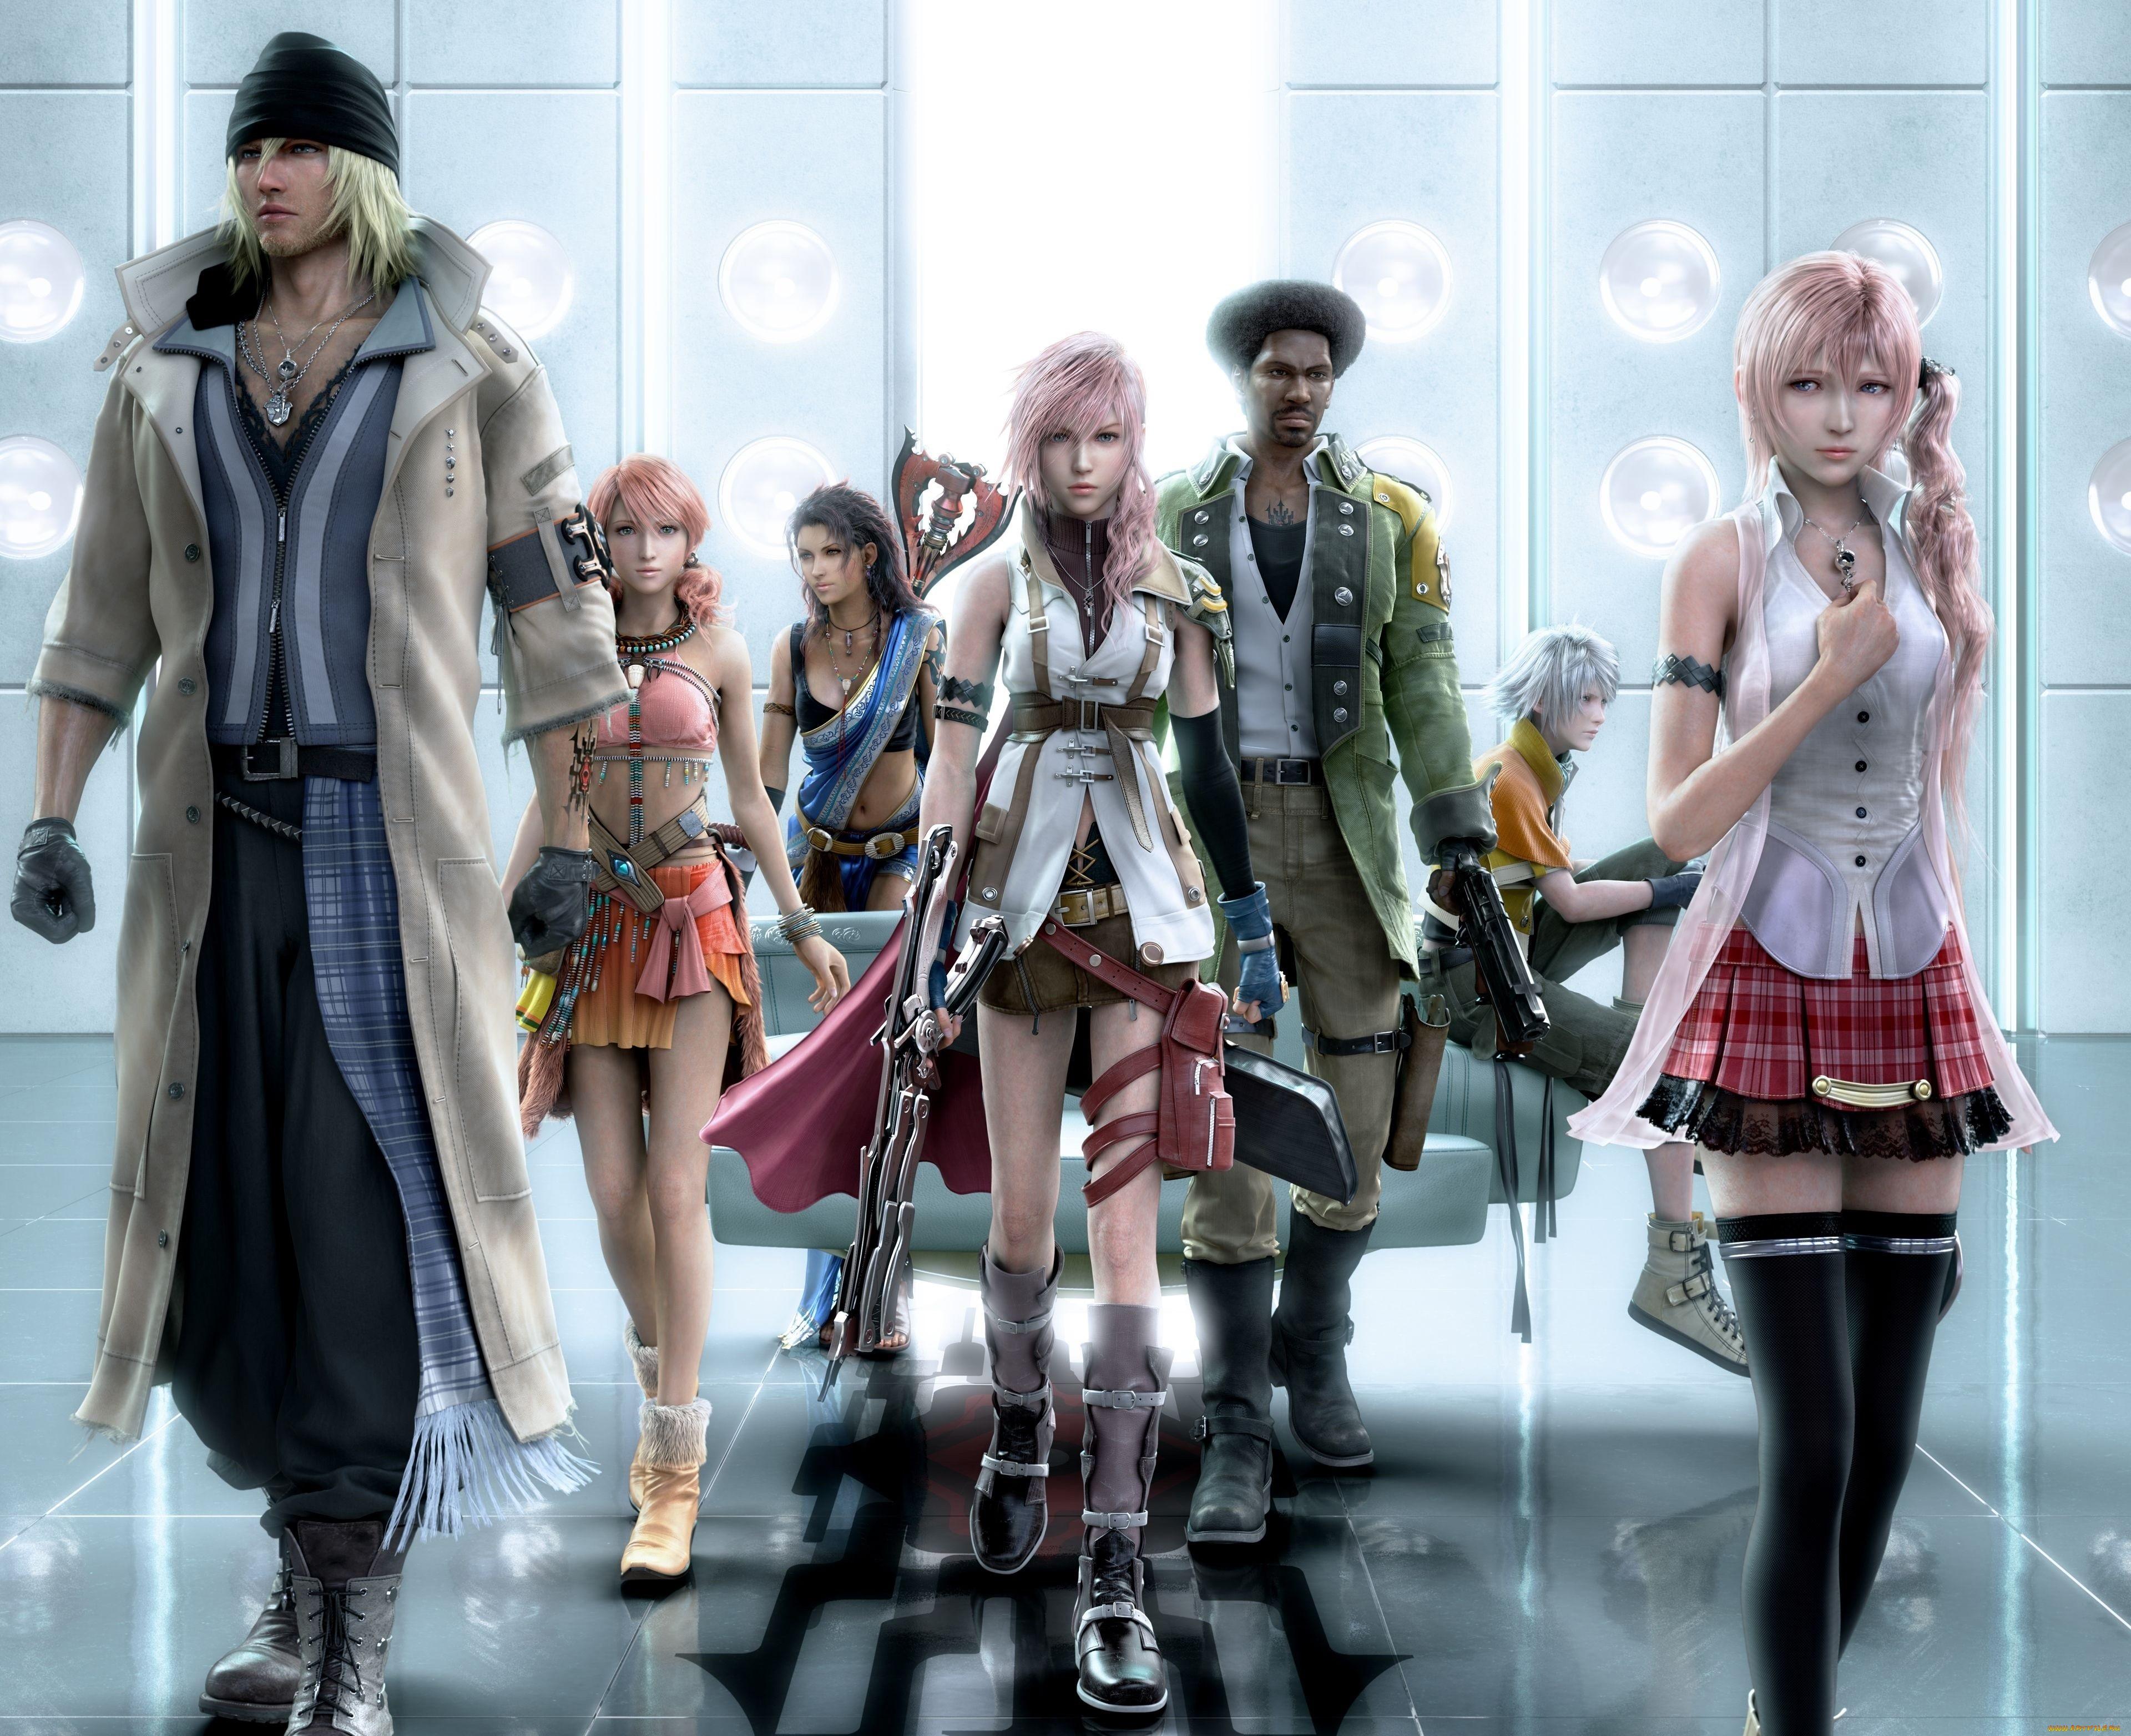 Final Fantasy 4k Hd Games 4k Wallpapers Images: Final Fantasy 4k Artwork, HD Games, 4k Wallpapers, Images